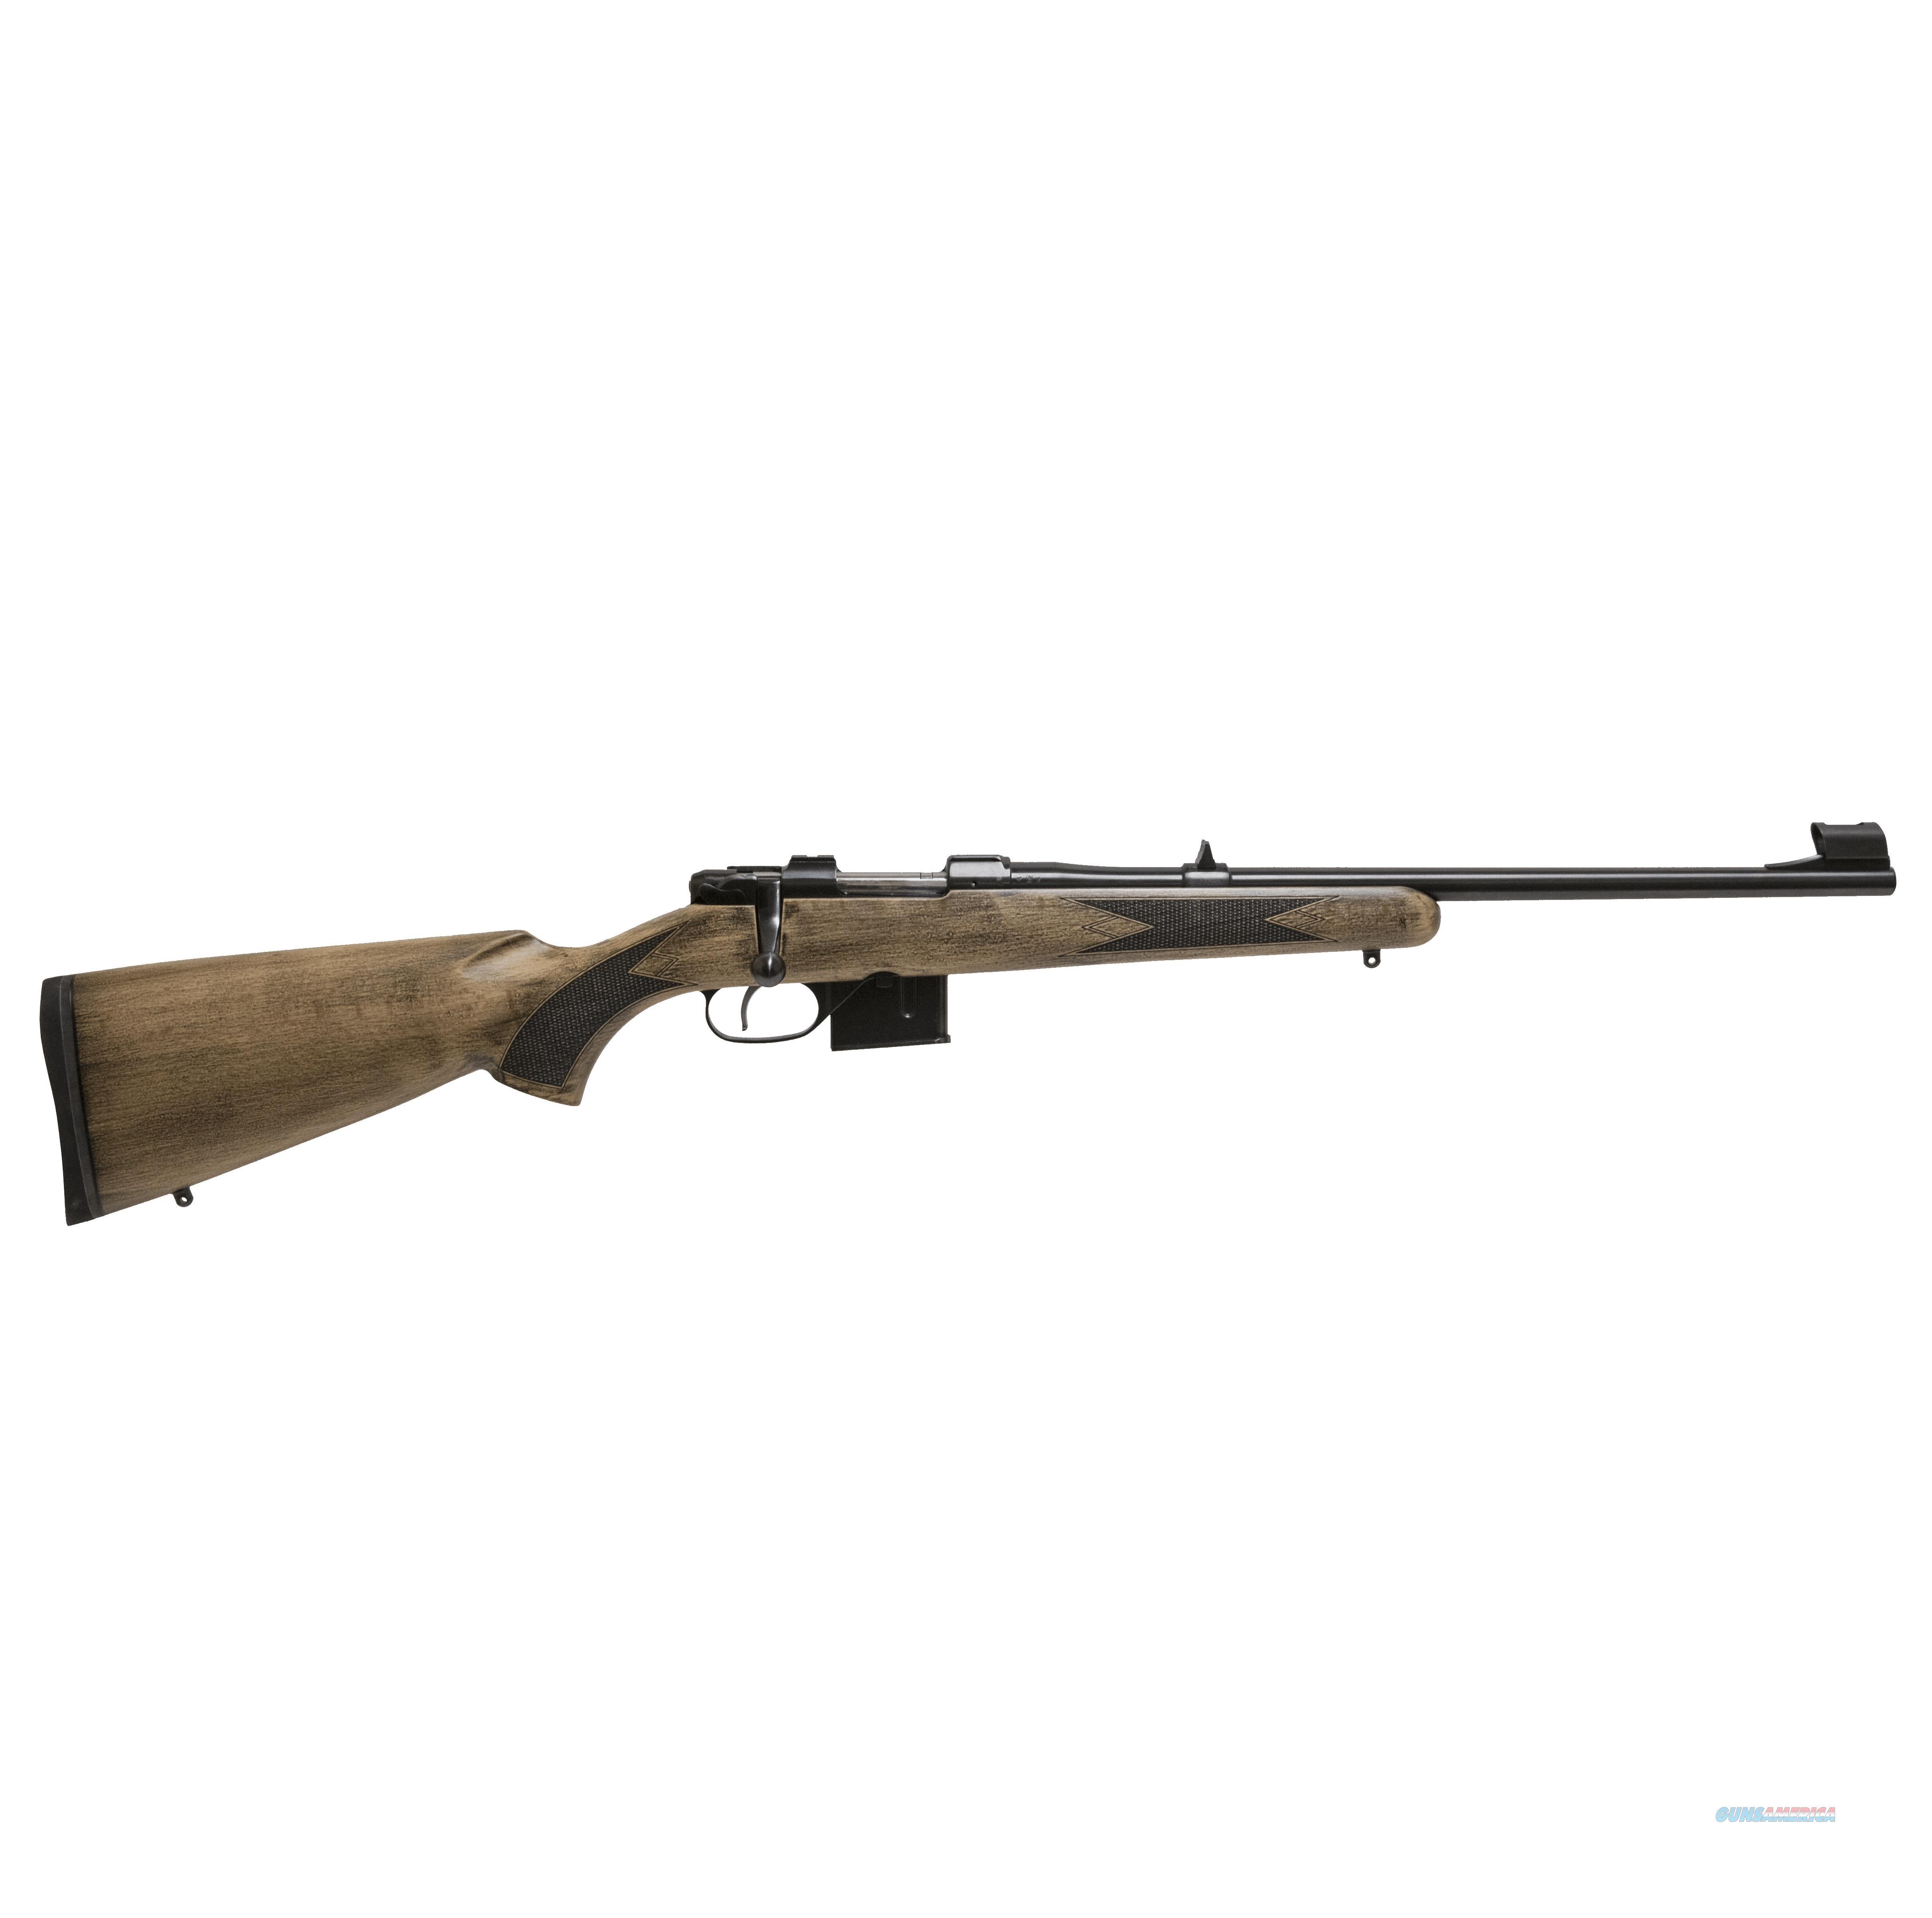 "CZ-USA 527 Carbine Rustic 7.62x39 Beechwood 18.5"" 5rd 03075   Guns > Rifles > CZ Rifles"